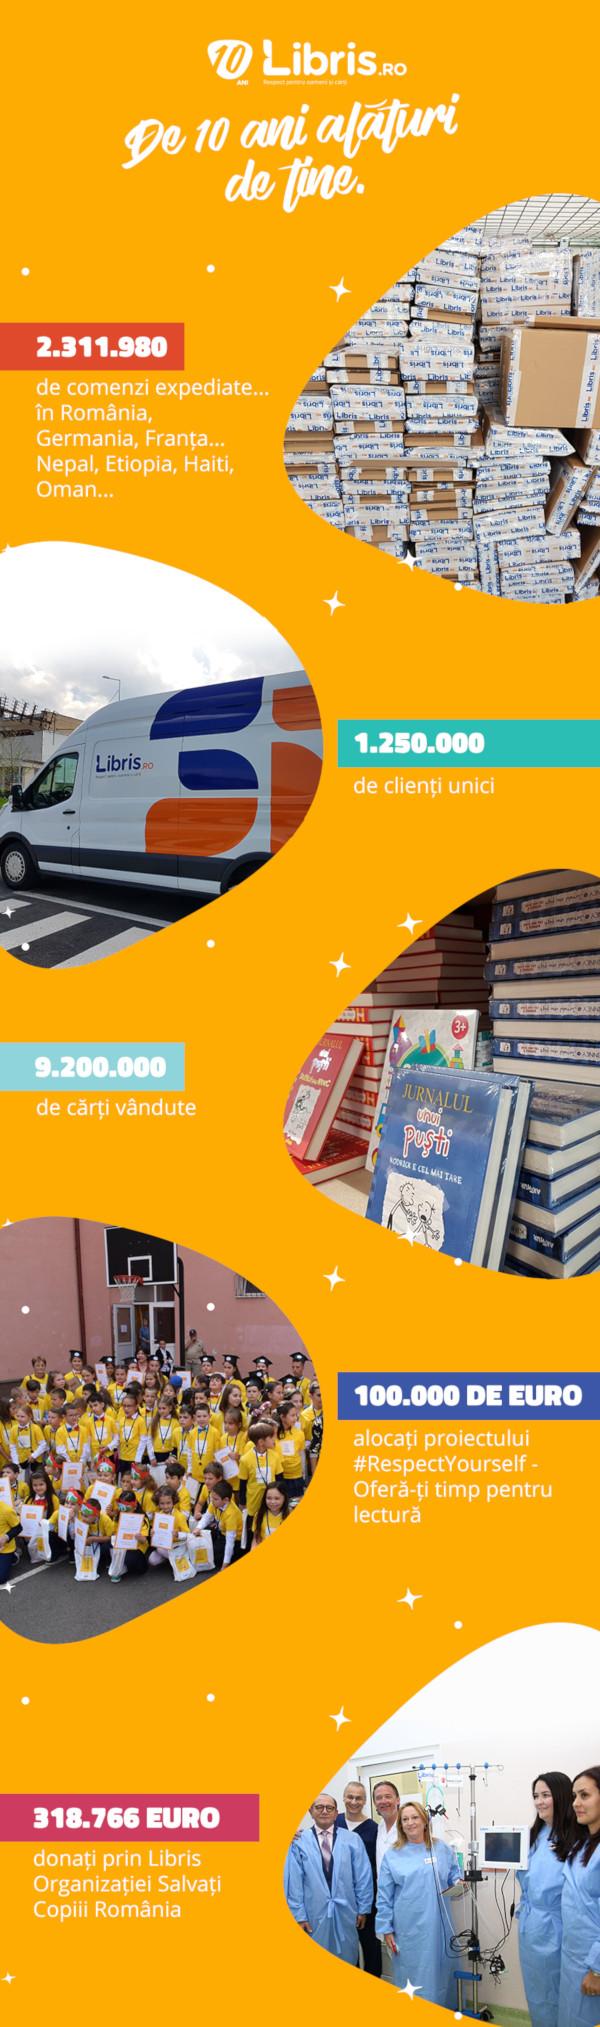 infografic Libris 10 Ani